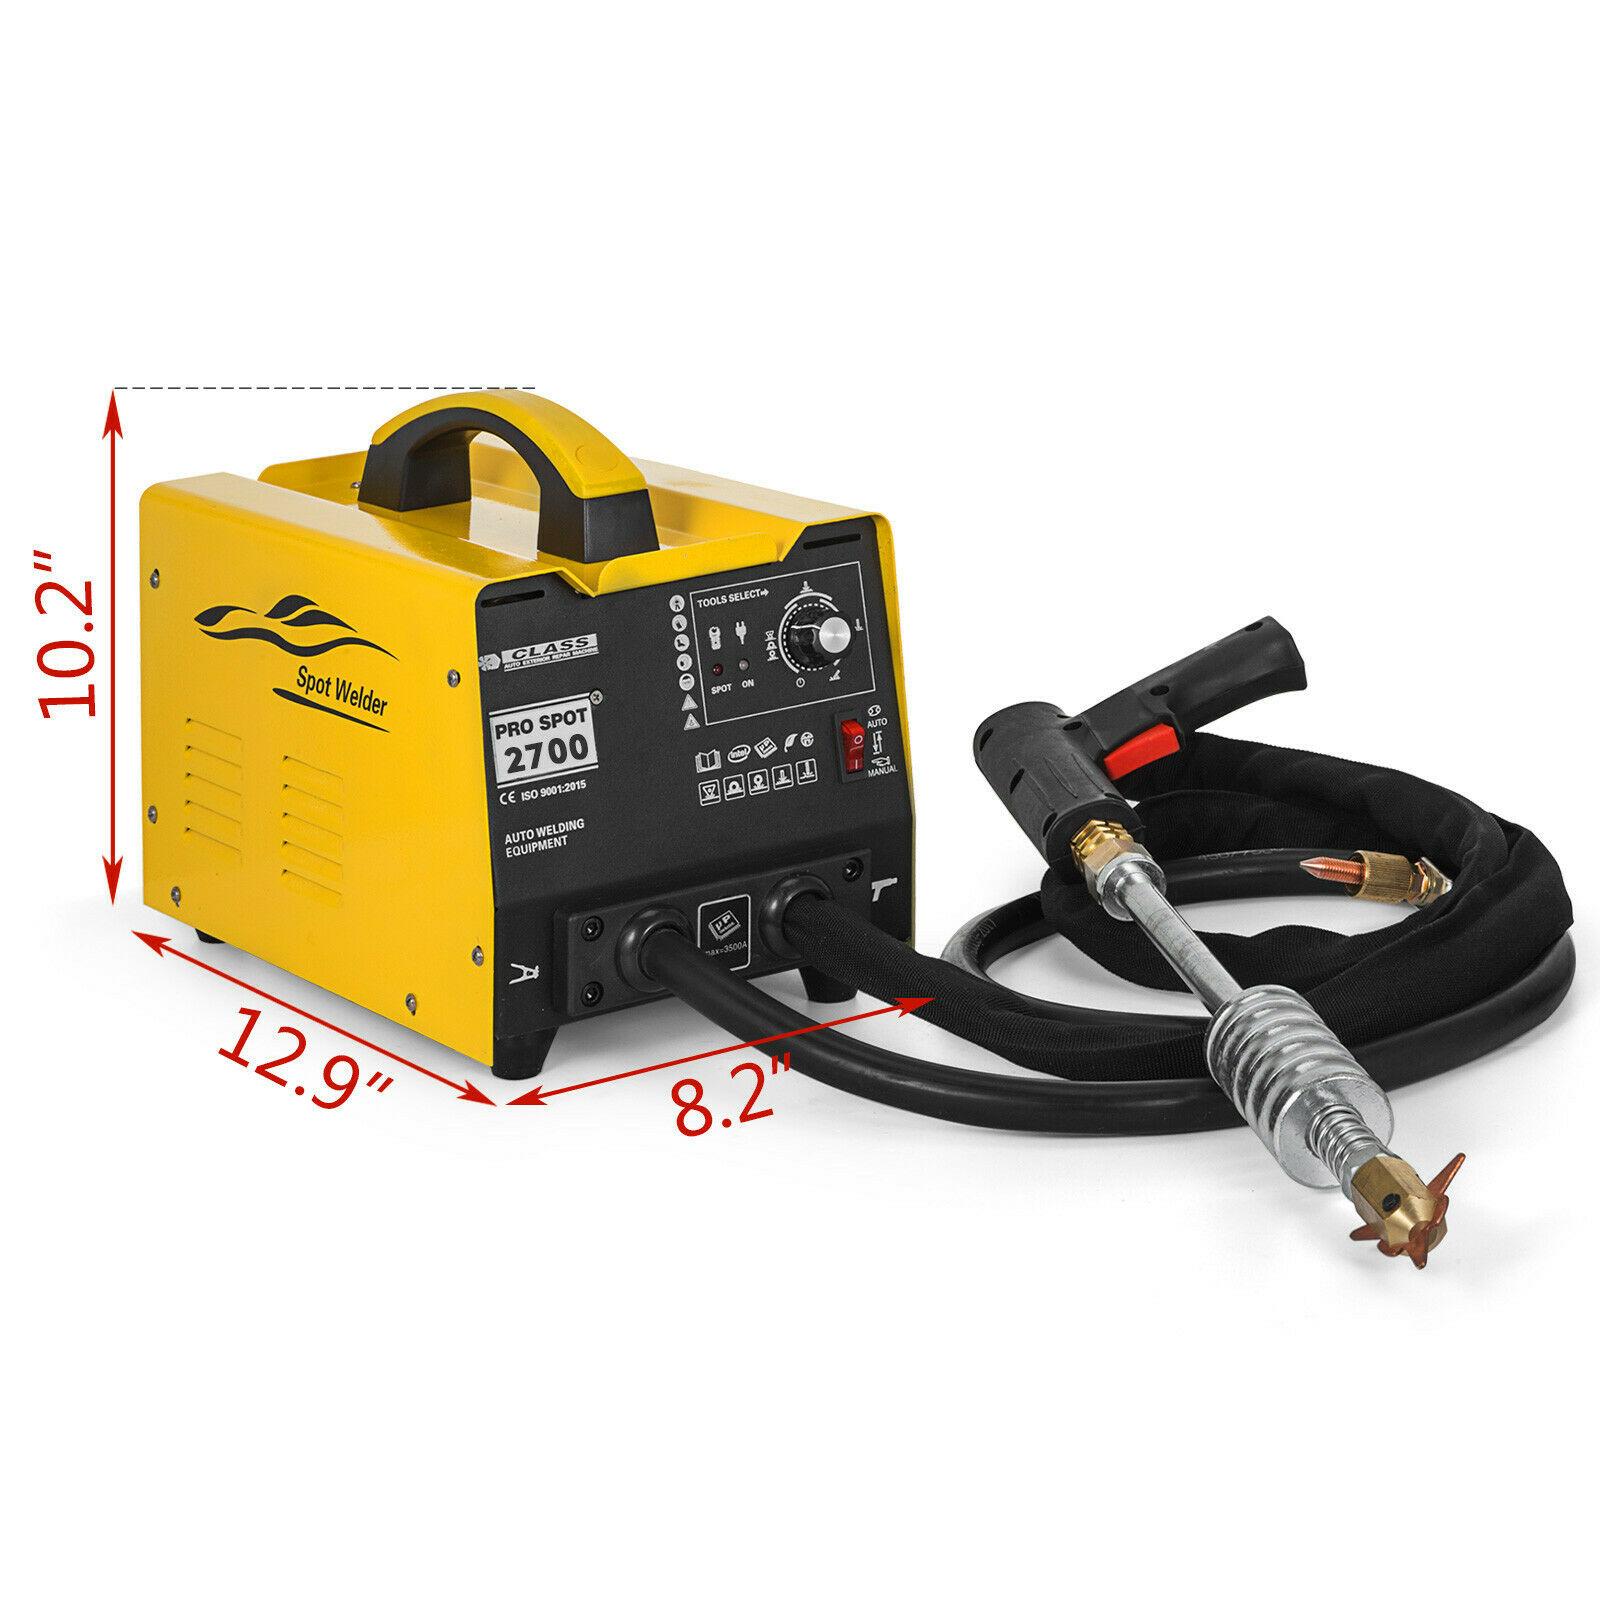 Tools : Dent Pulling 2700 Spot Puller Bonnet Dent Repair Stud Welder